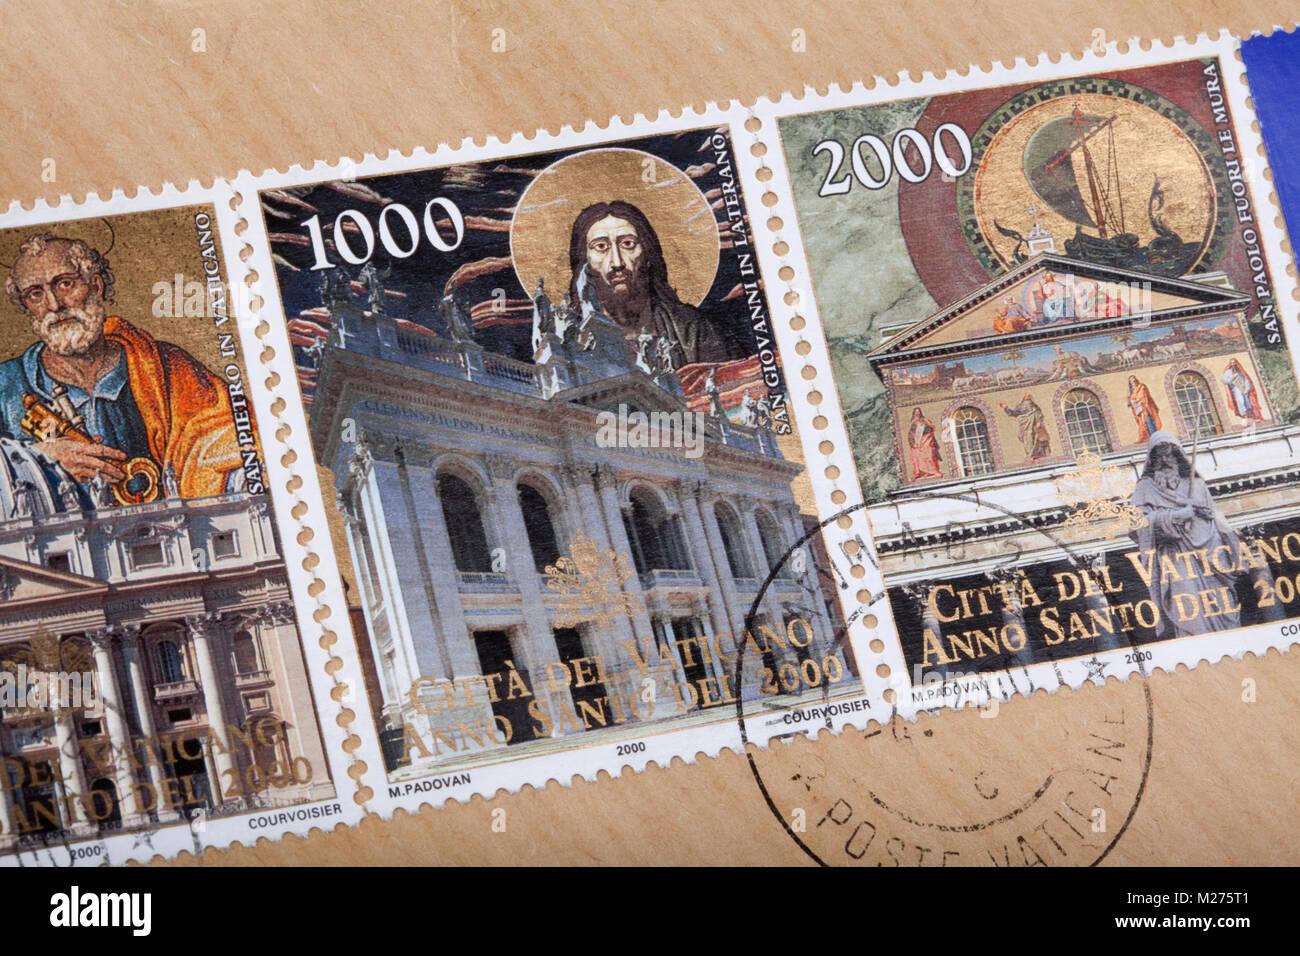 Stamps from the Vatican on a letter, Stamped, Vatican, Italy, Europe, Gestempelte Briefmarken aus dem Vatikan zum - Stock Image